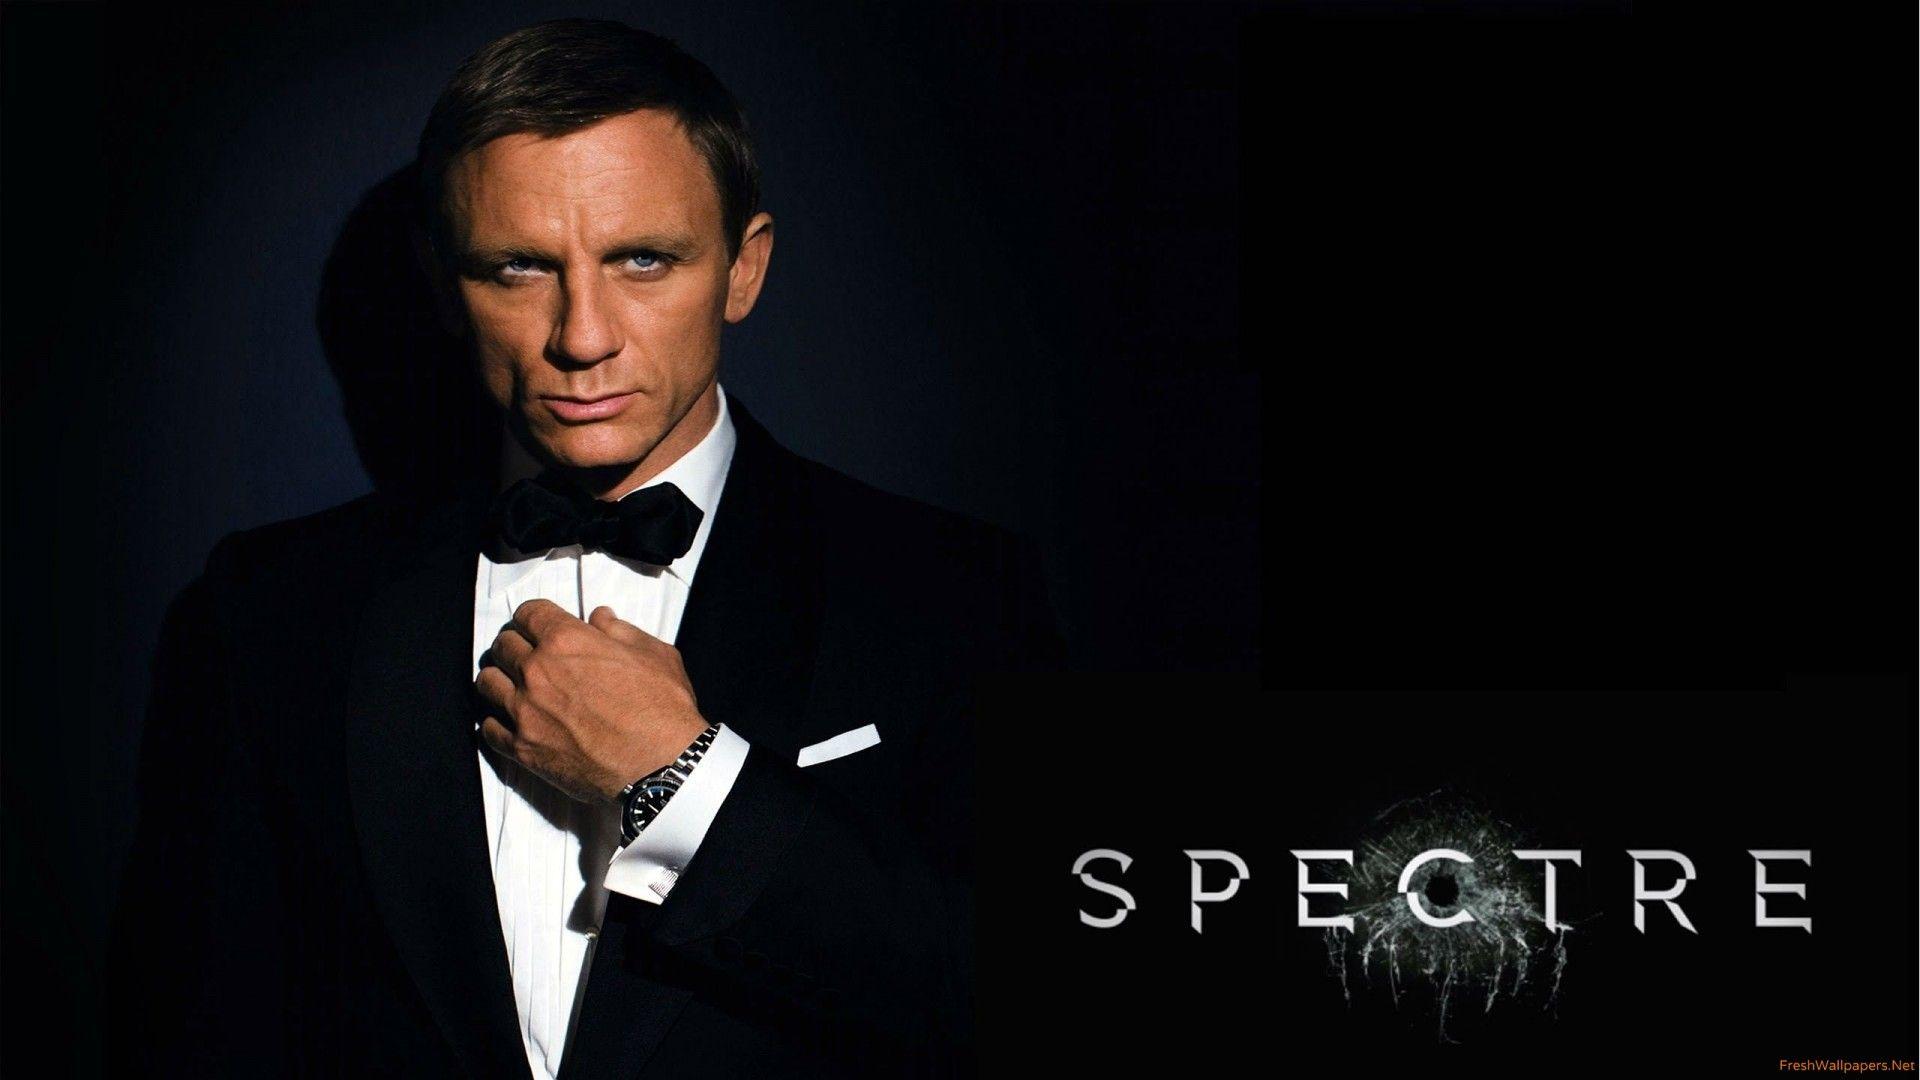 James Bond Casino Royale Hd Desktop Wallpaper High Definition James Bond Casino Royale Heart Healthy Dinners Bond